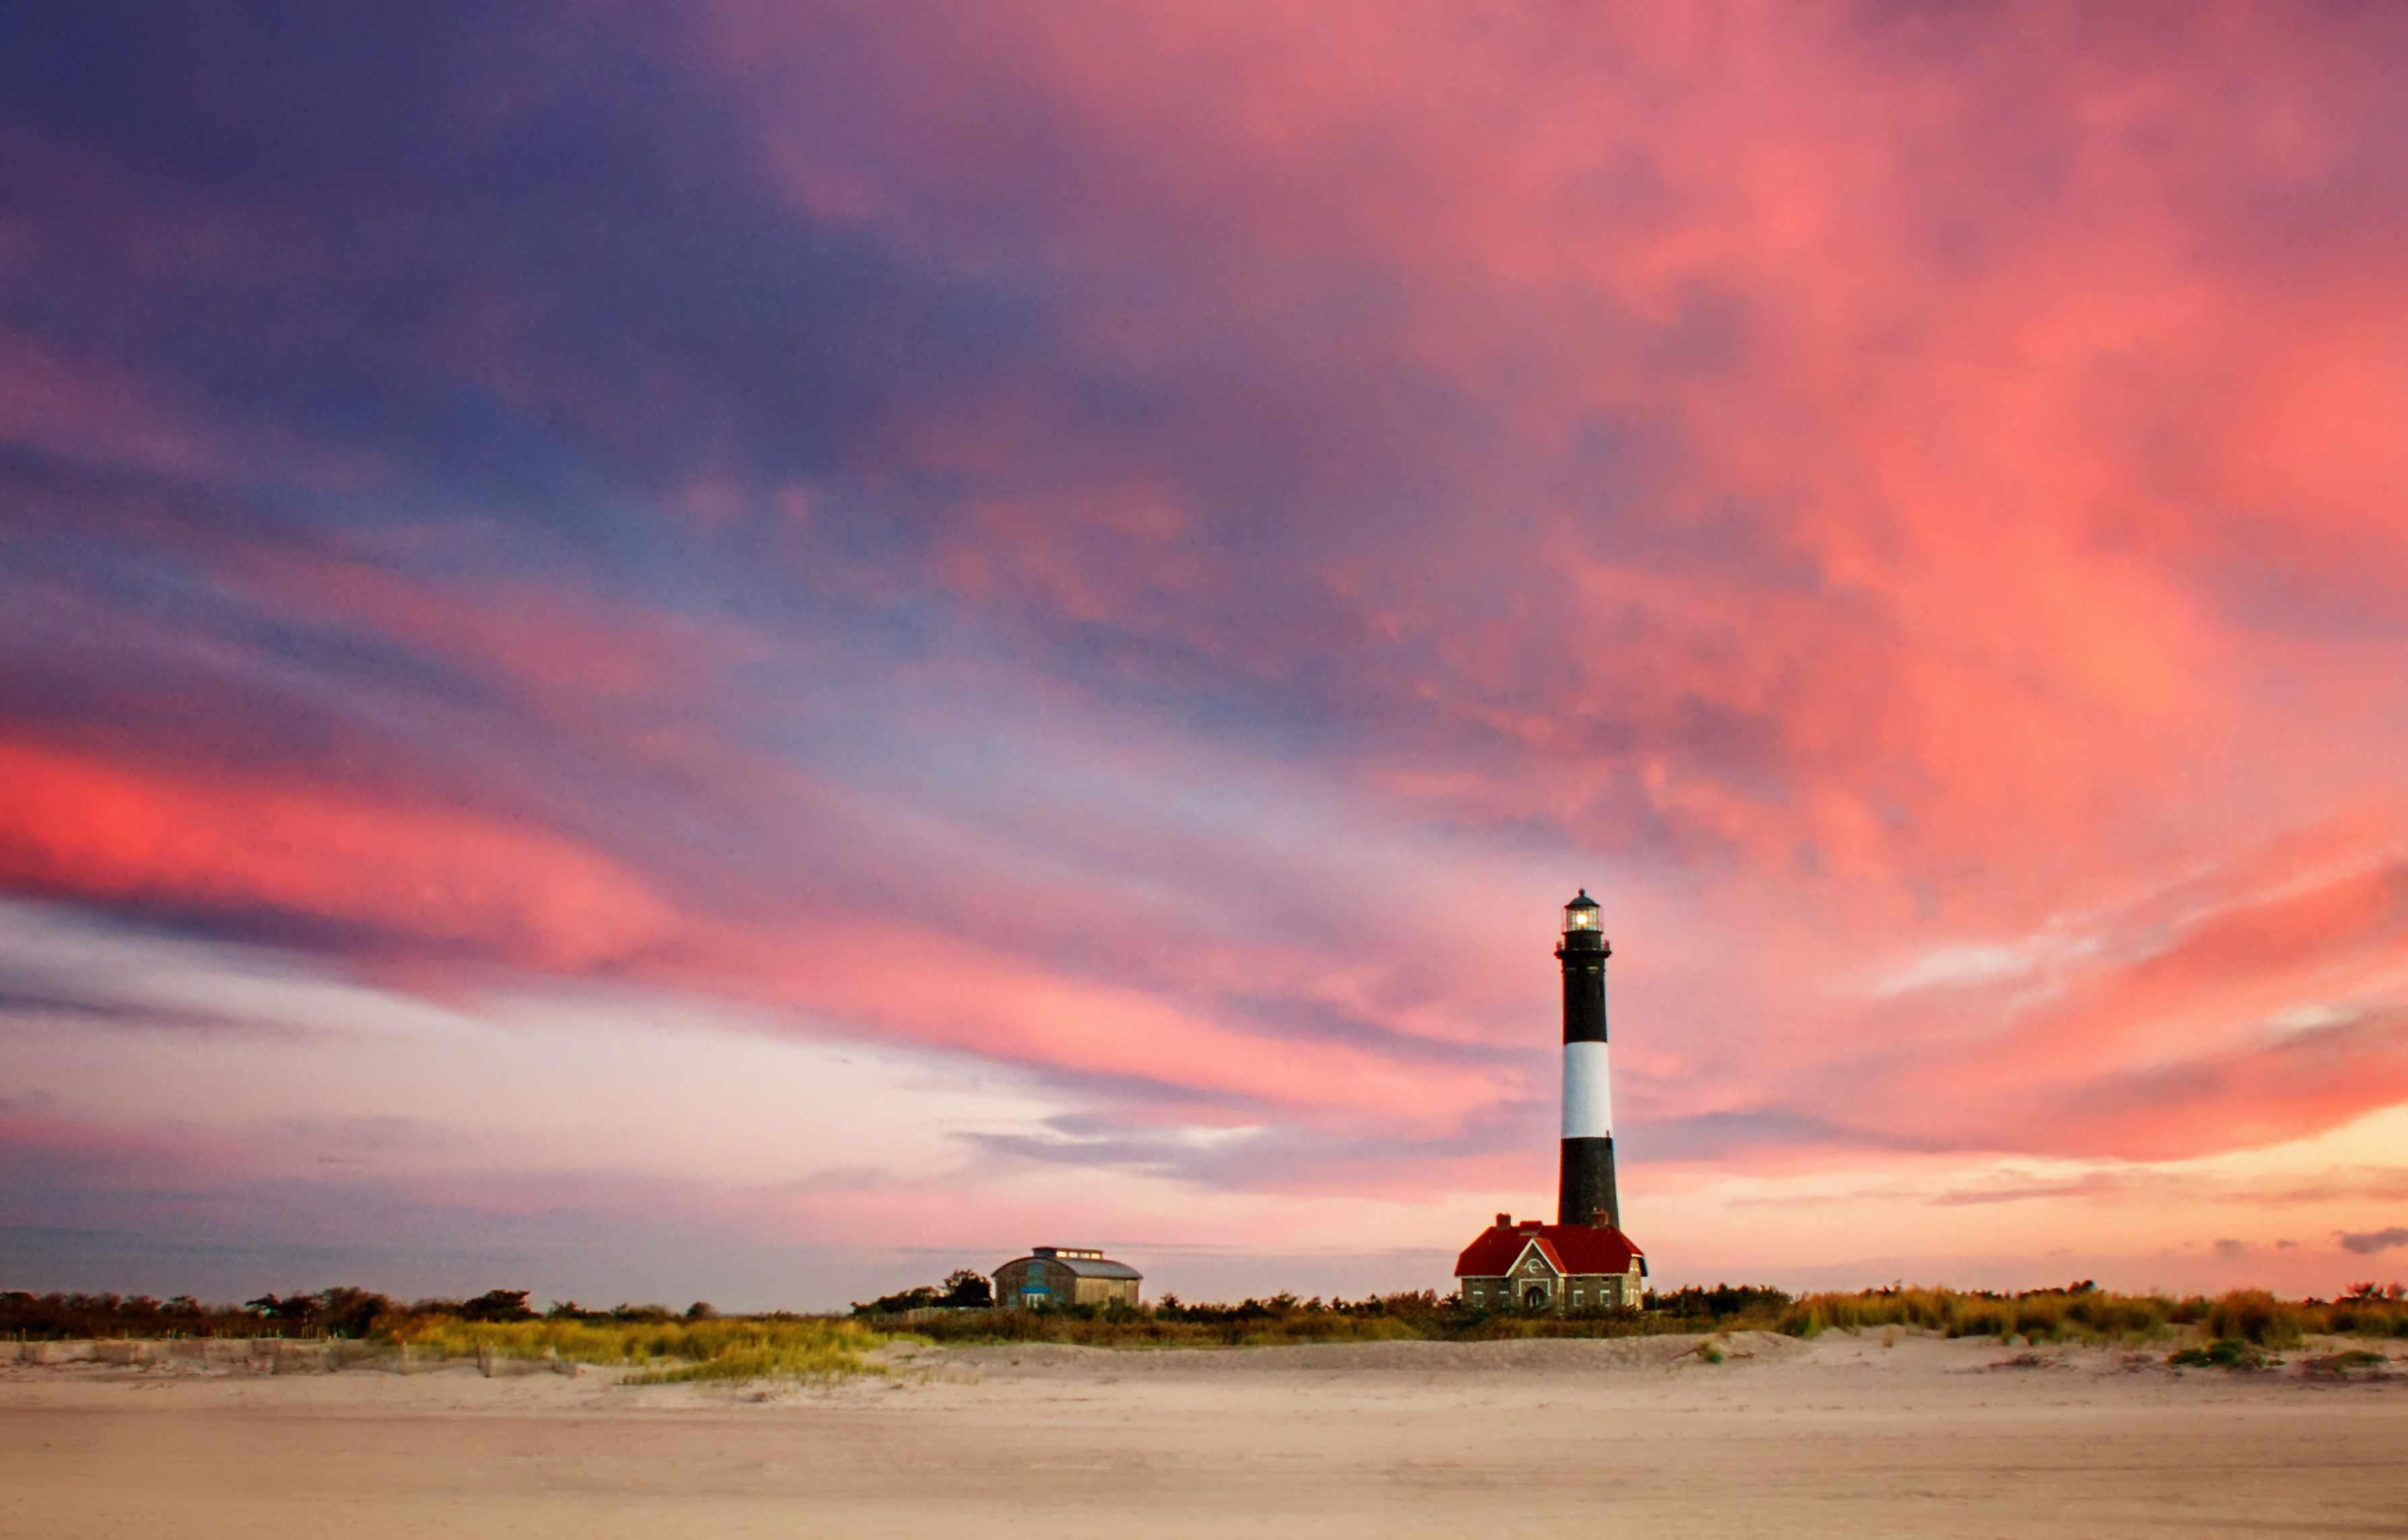 Dramatic Pink Sunrise at Fire island Lighthouse